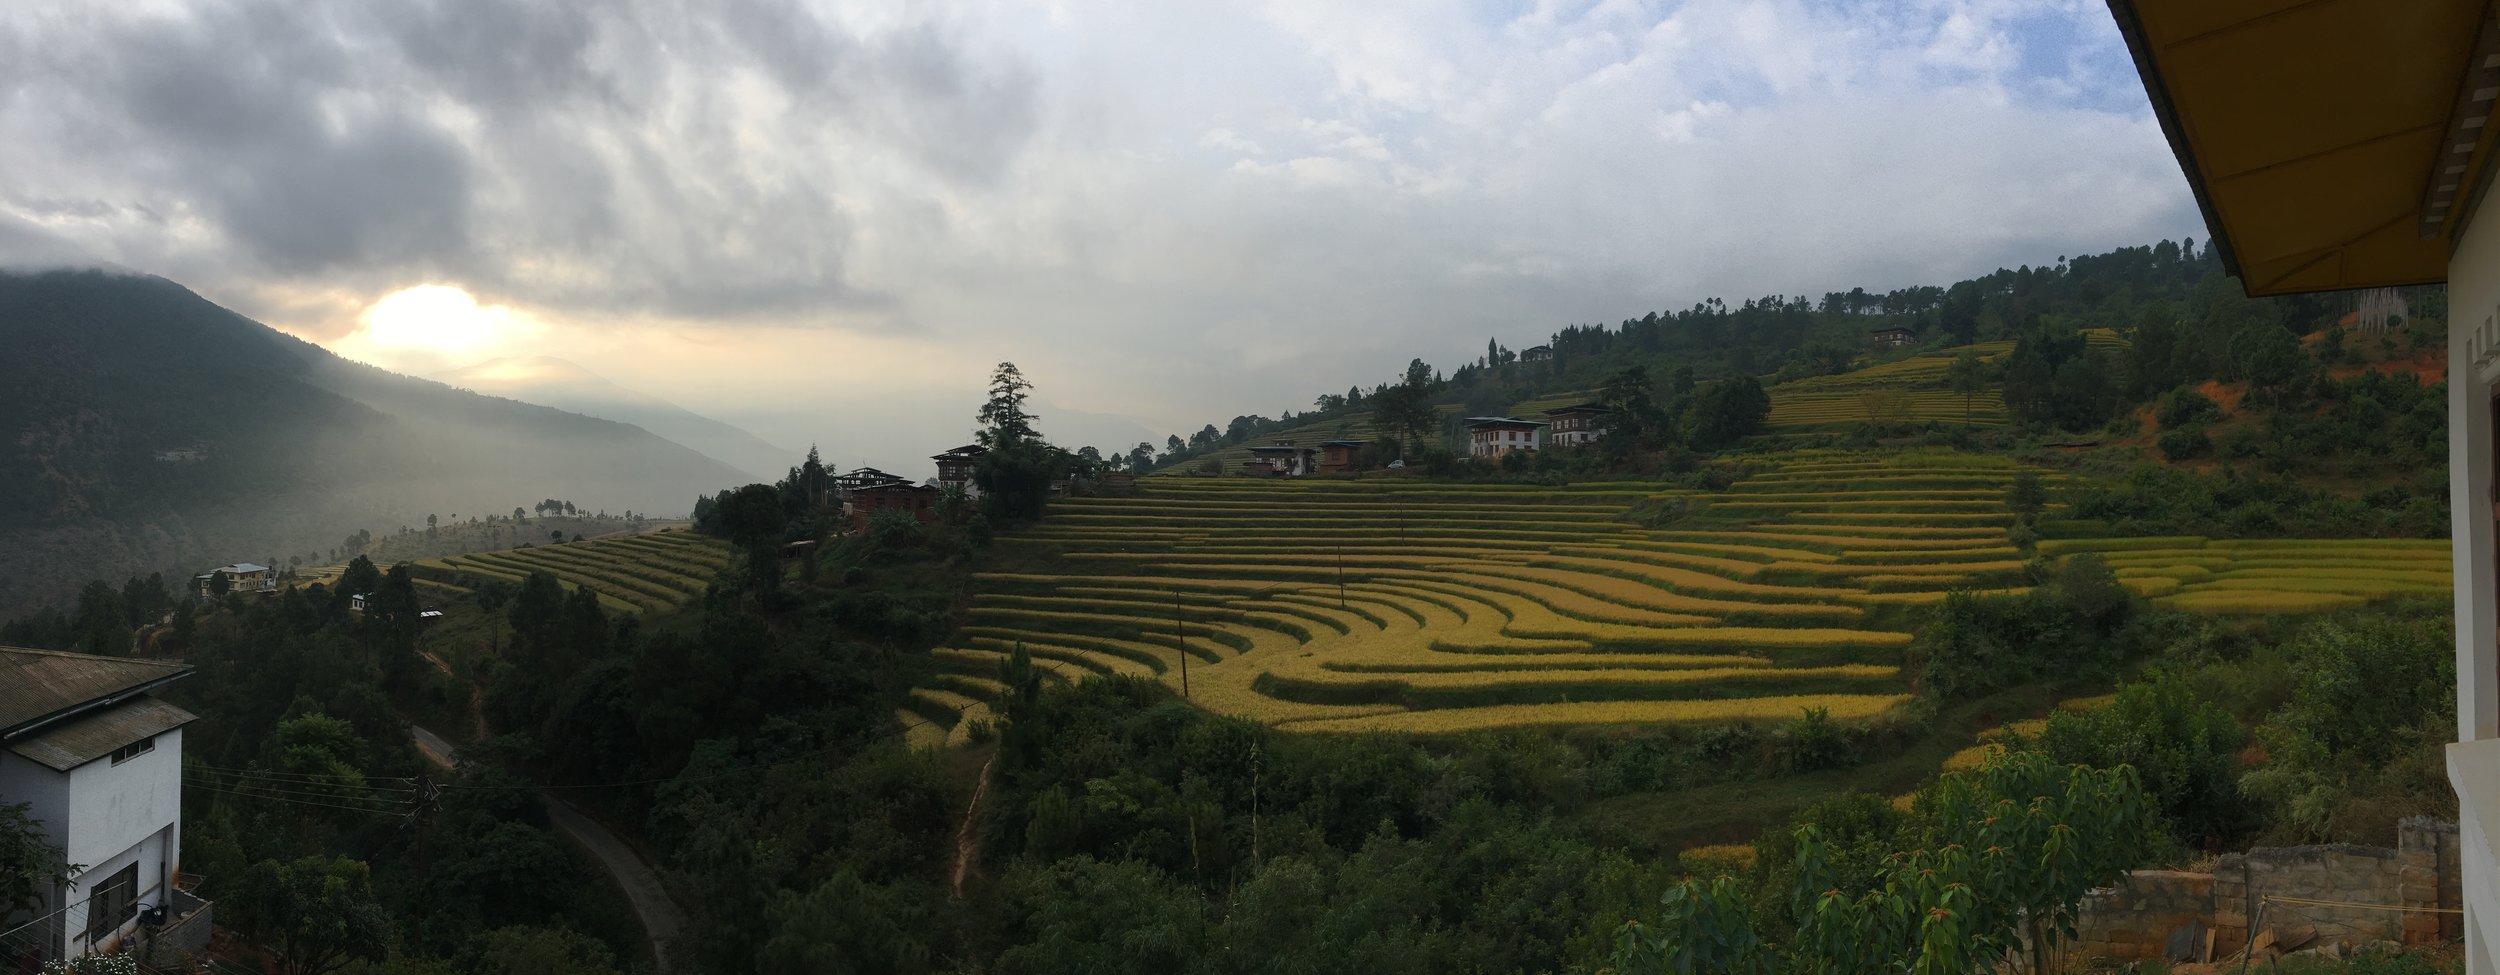 Sunrise in Pukahana, Bhutan